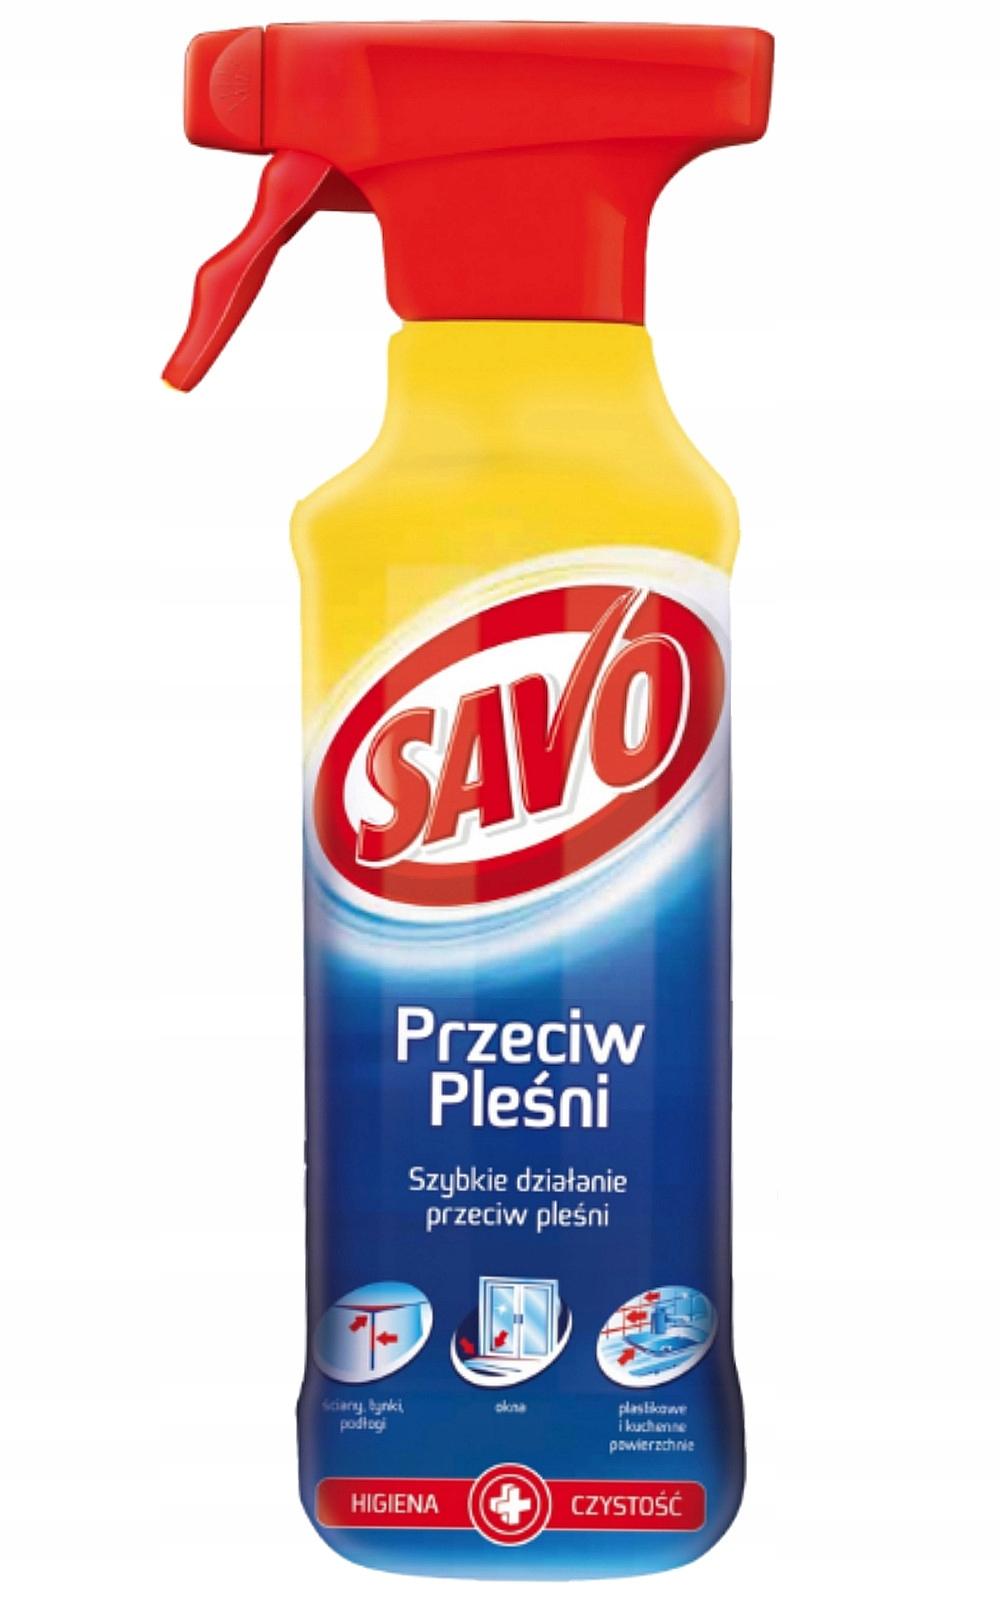 Спрей Savo Очистки на Плесень Грибы спрей 500мл